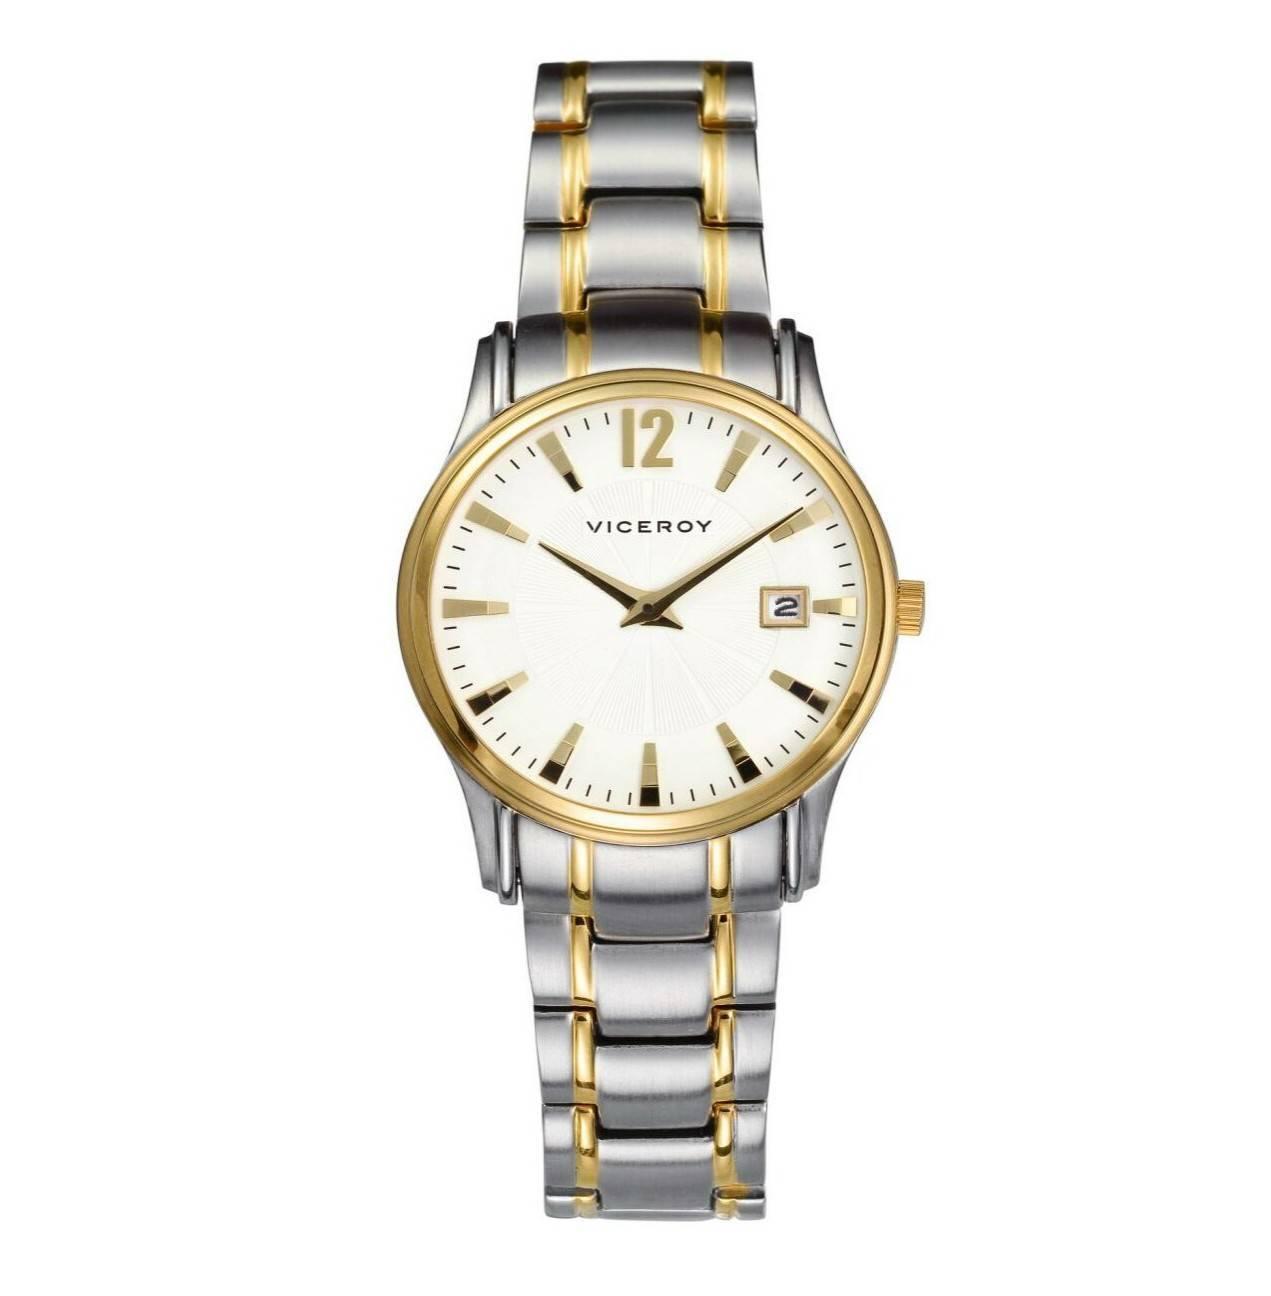 405ef816d845 Reloj Viceroy bicolor clásico señora Joyería Juan Luis Larráyoz Pamplona